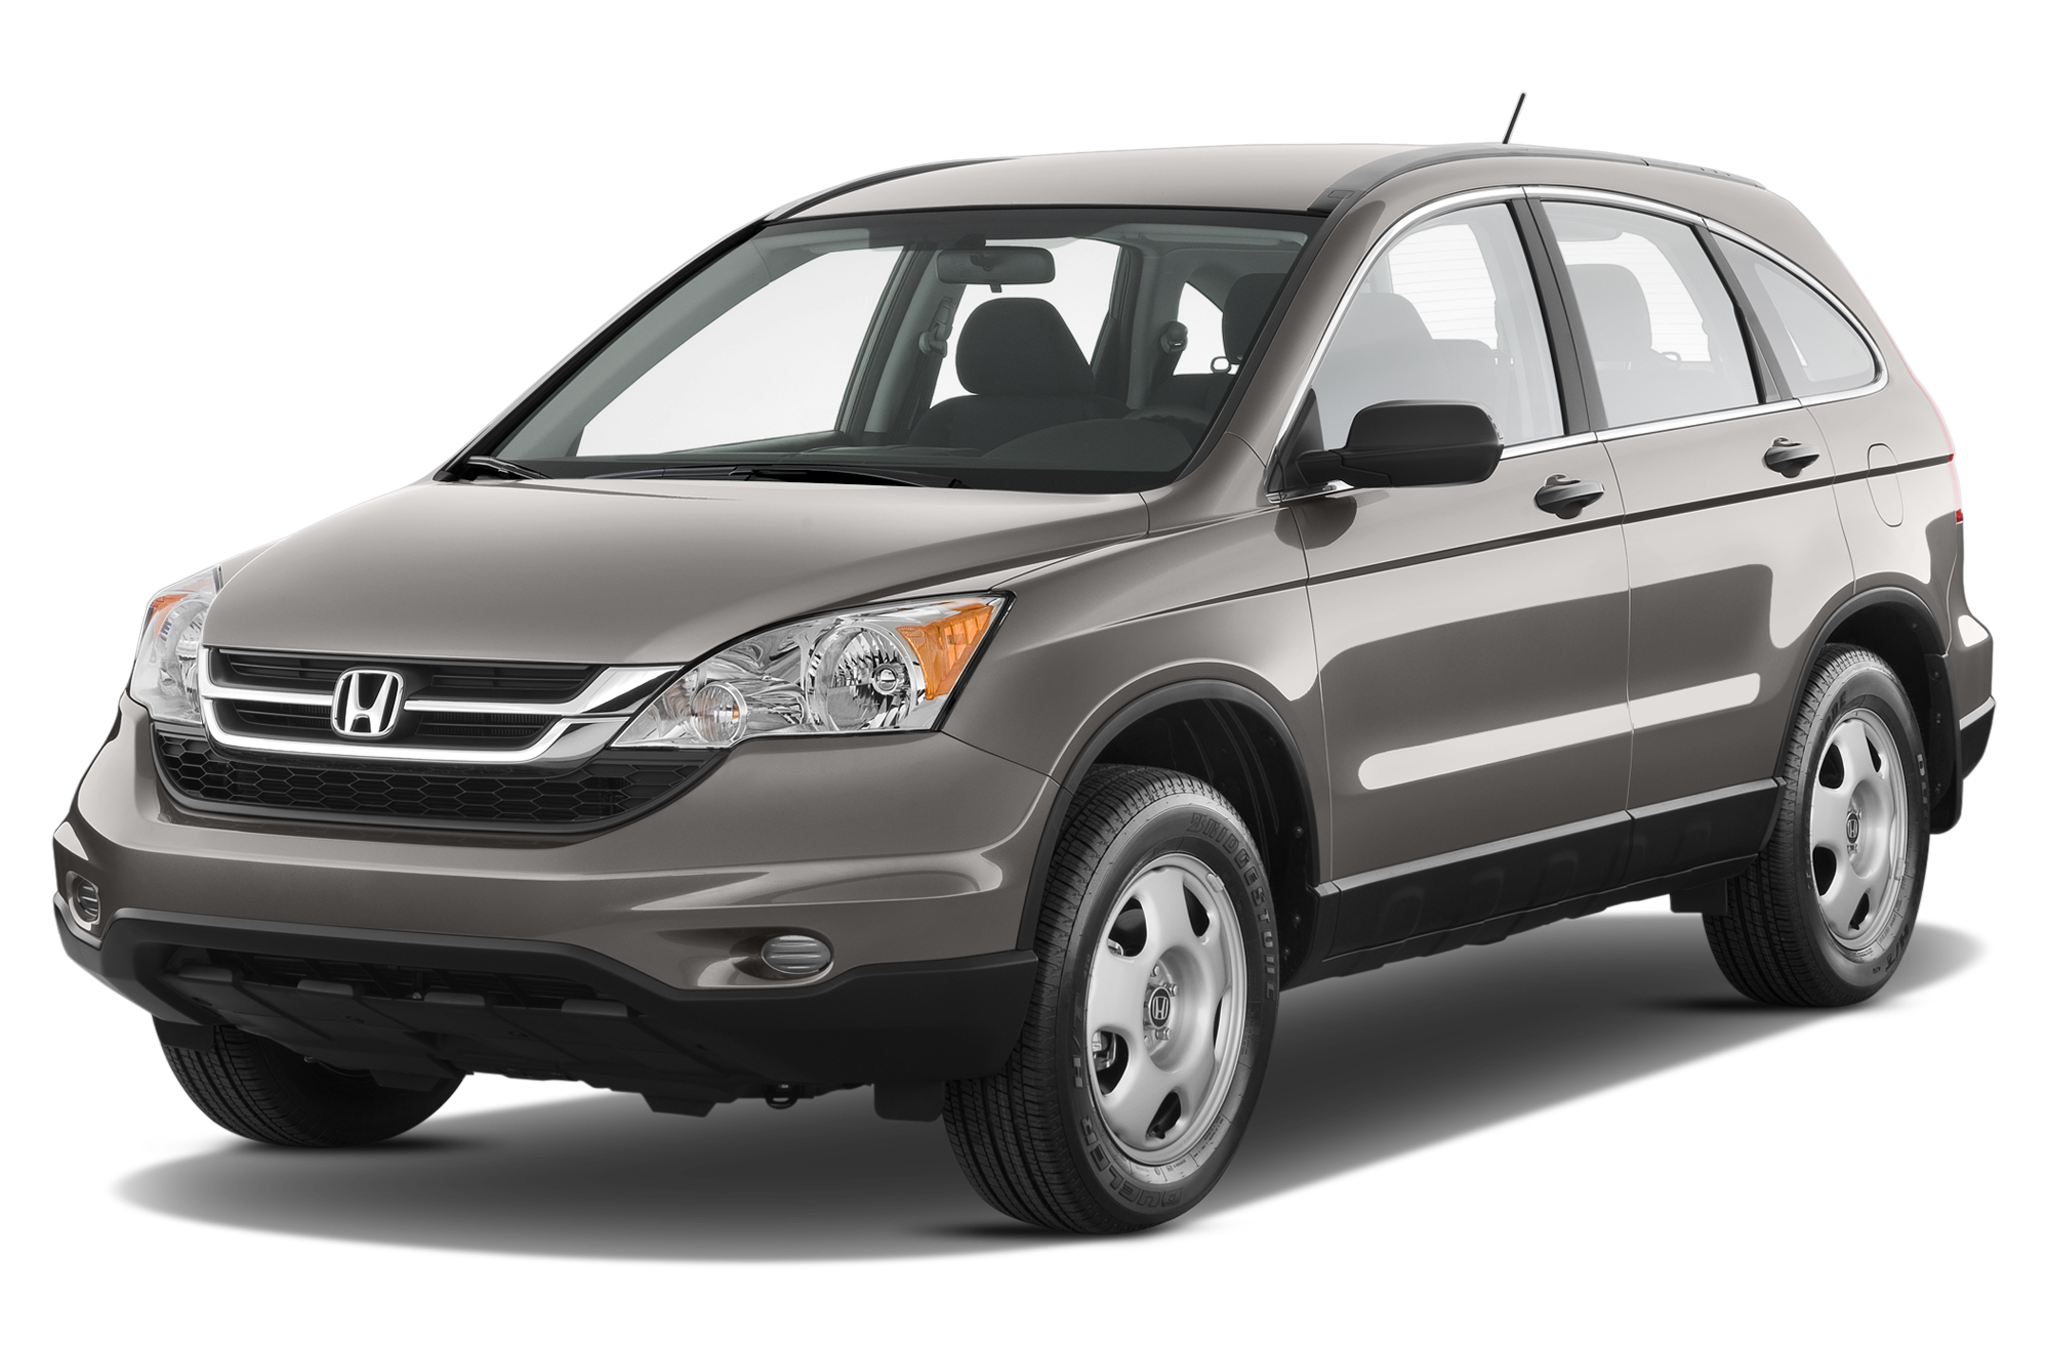 Honda Crv PNG - 108899